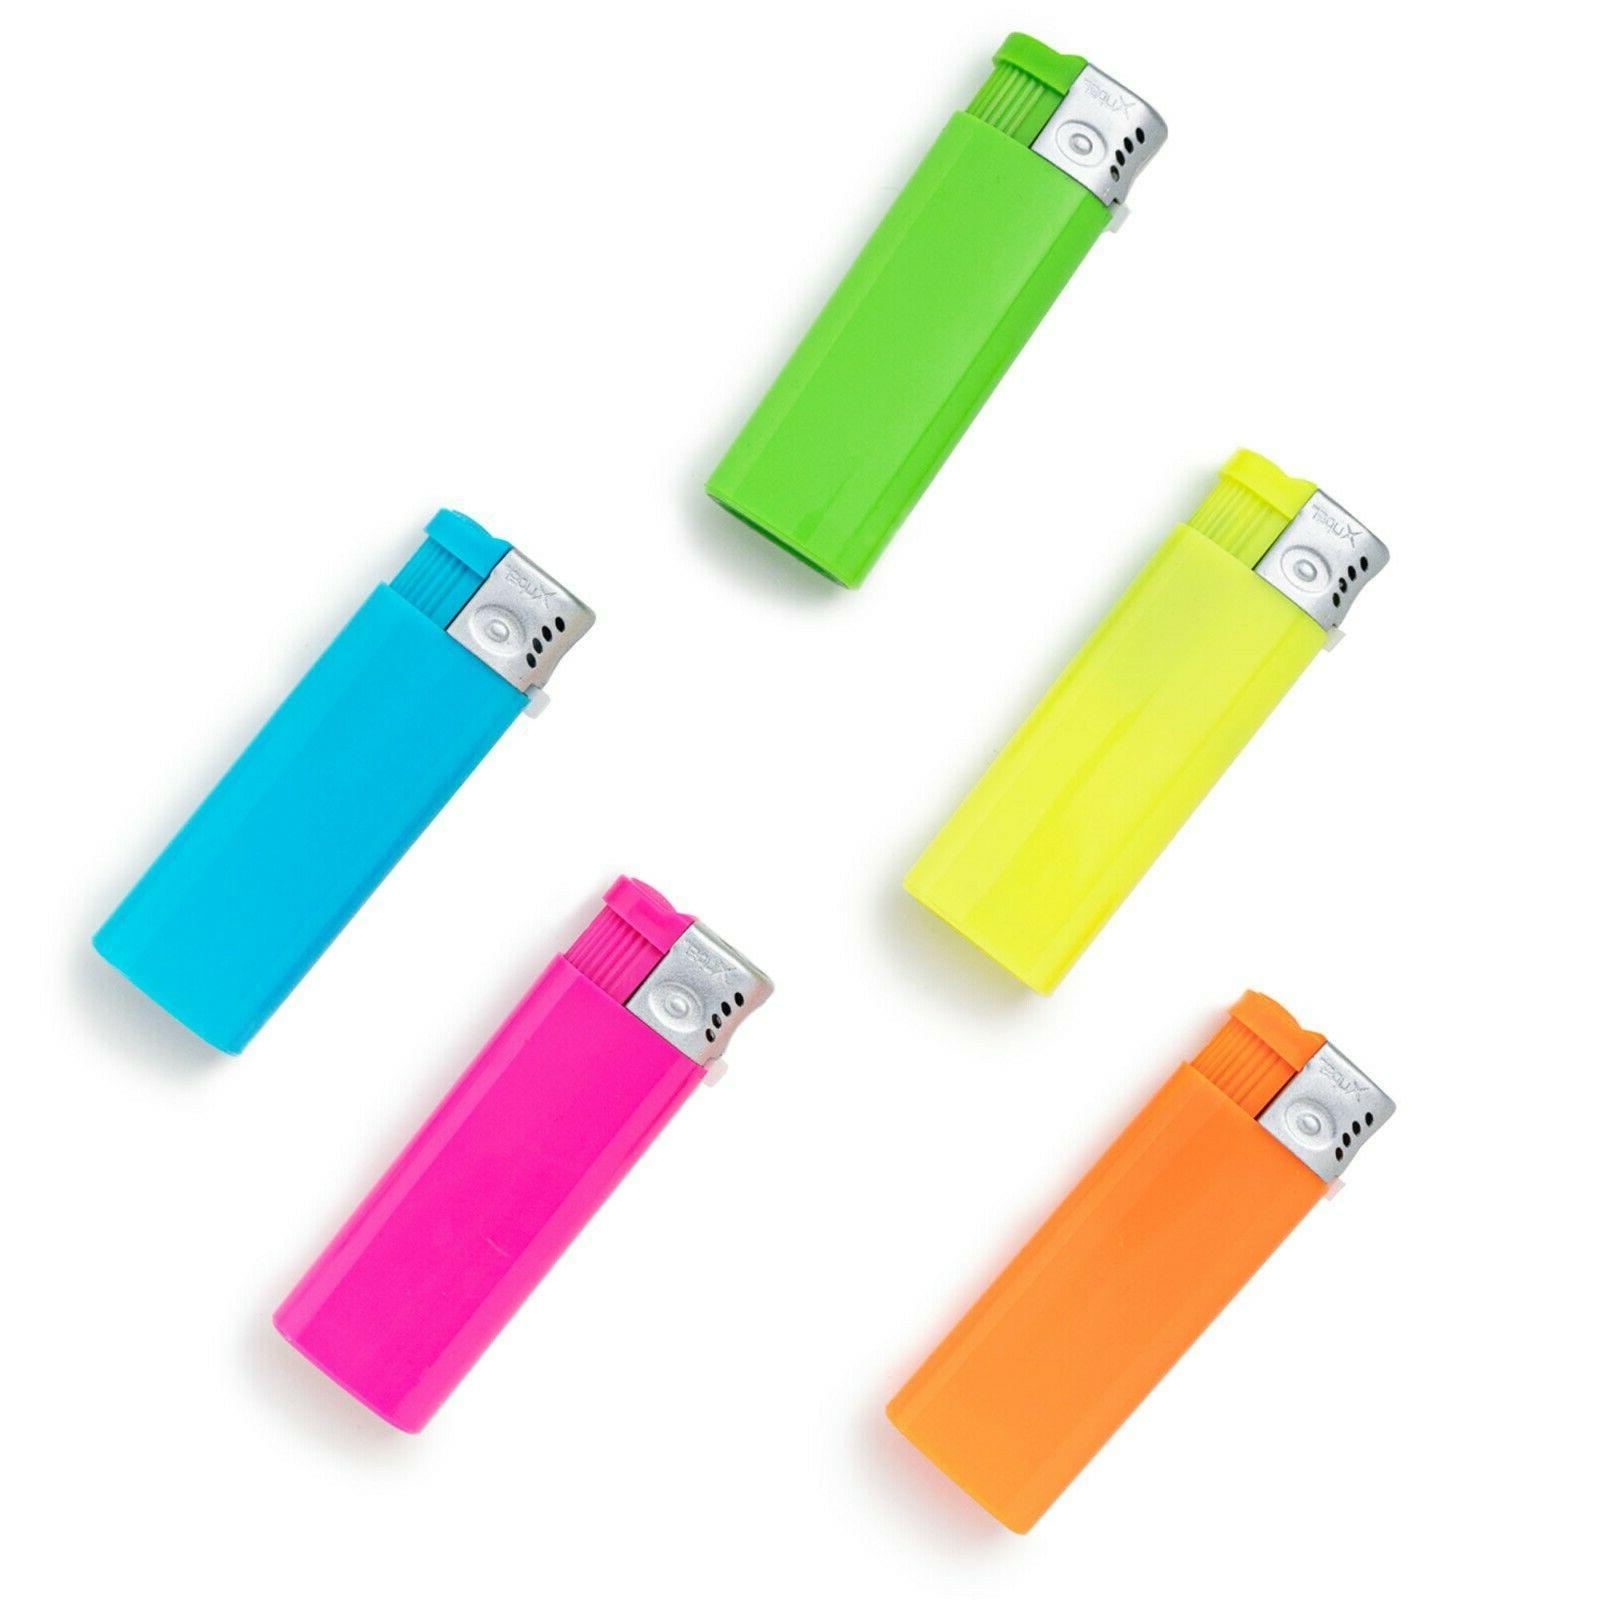 5 Pack Jet Lighters Adjustable & Butane Refillable